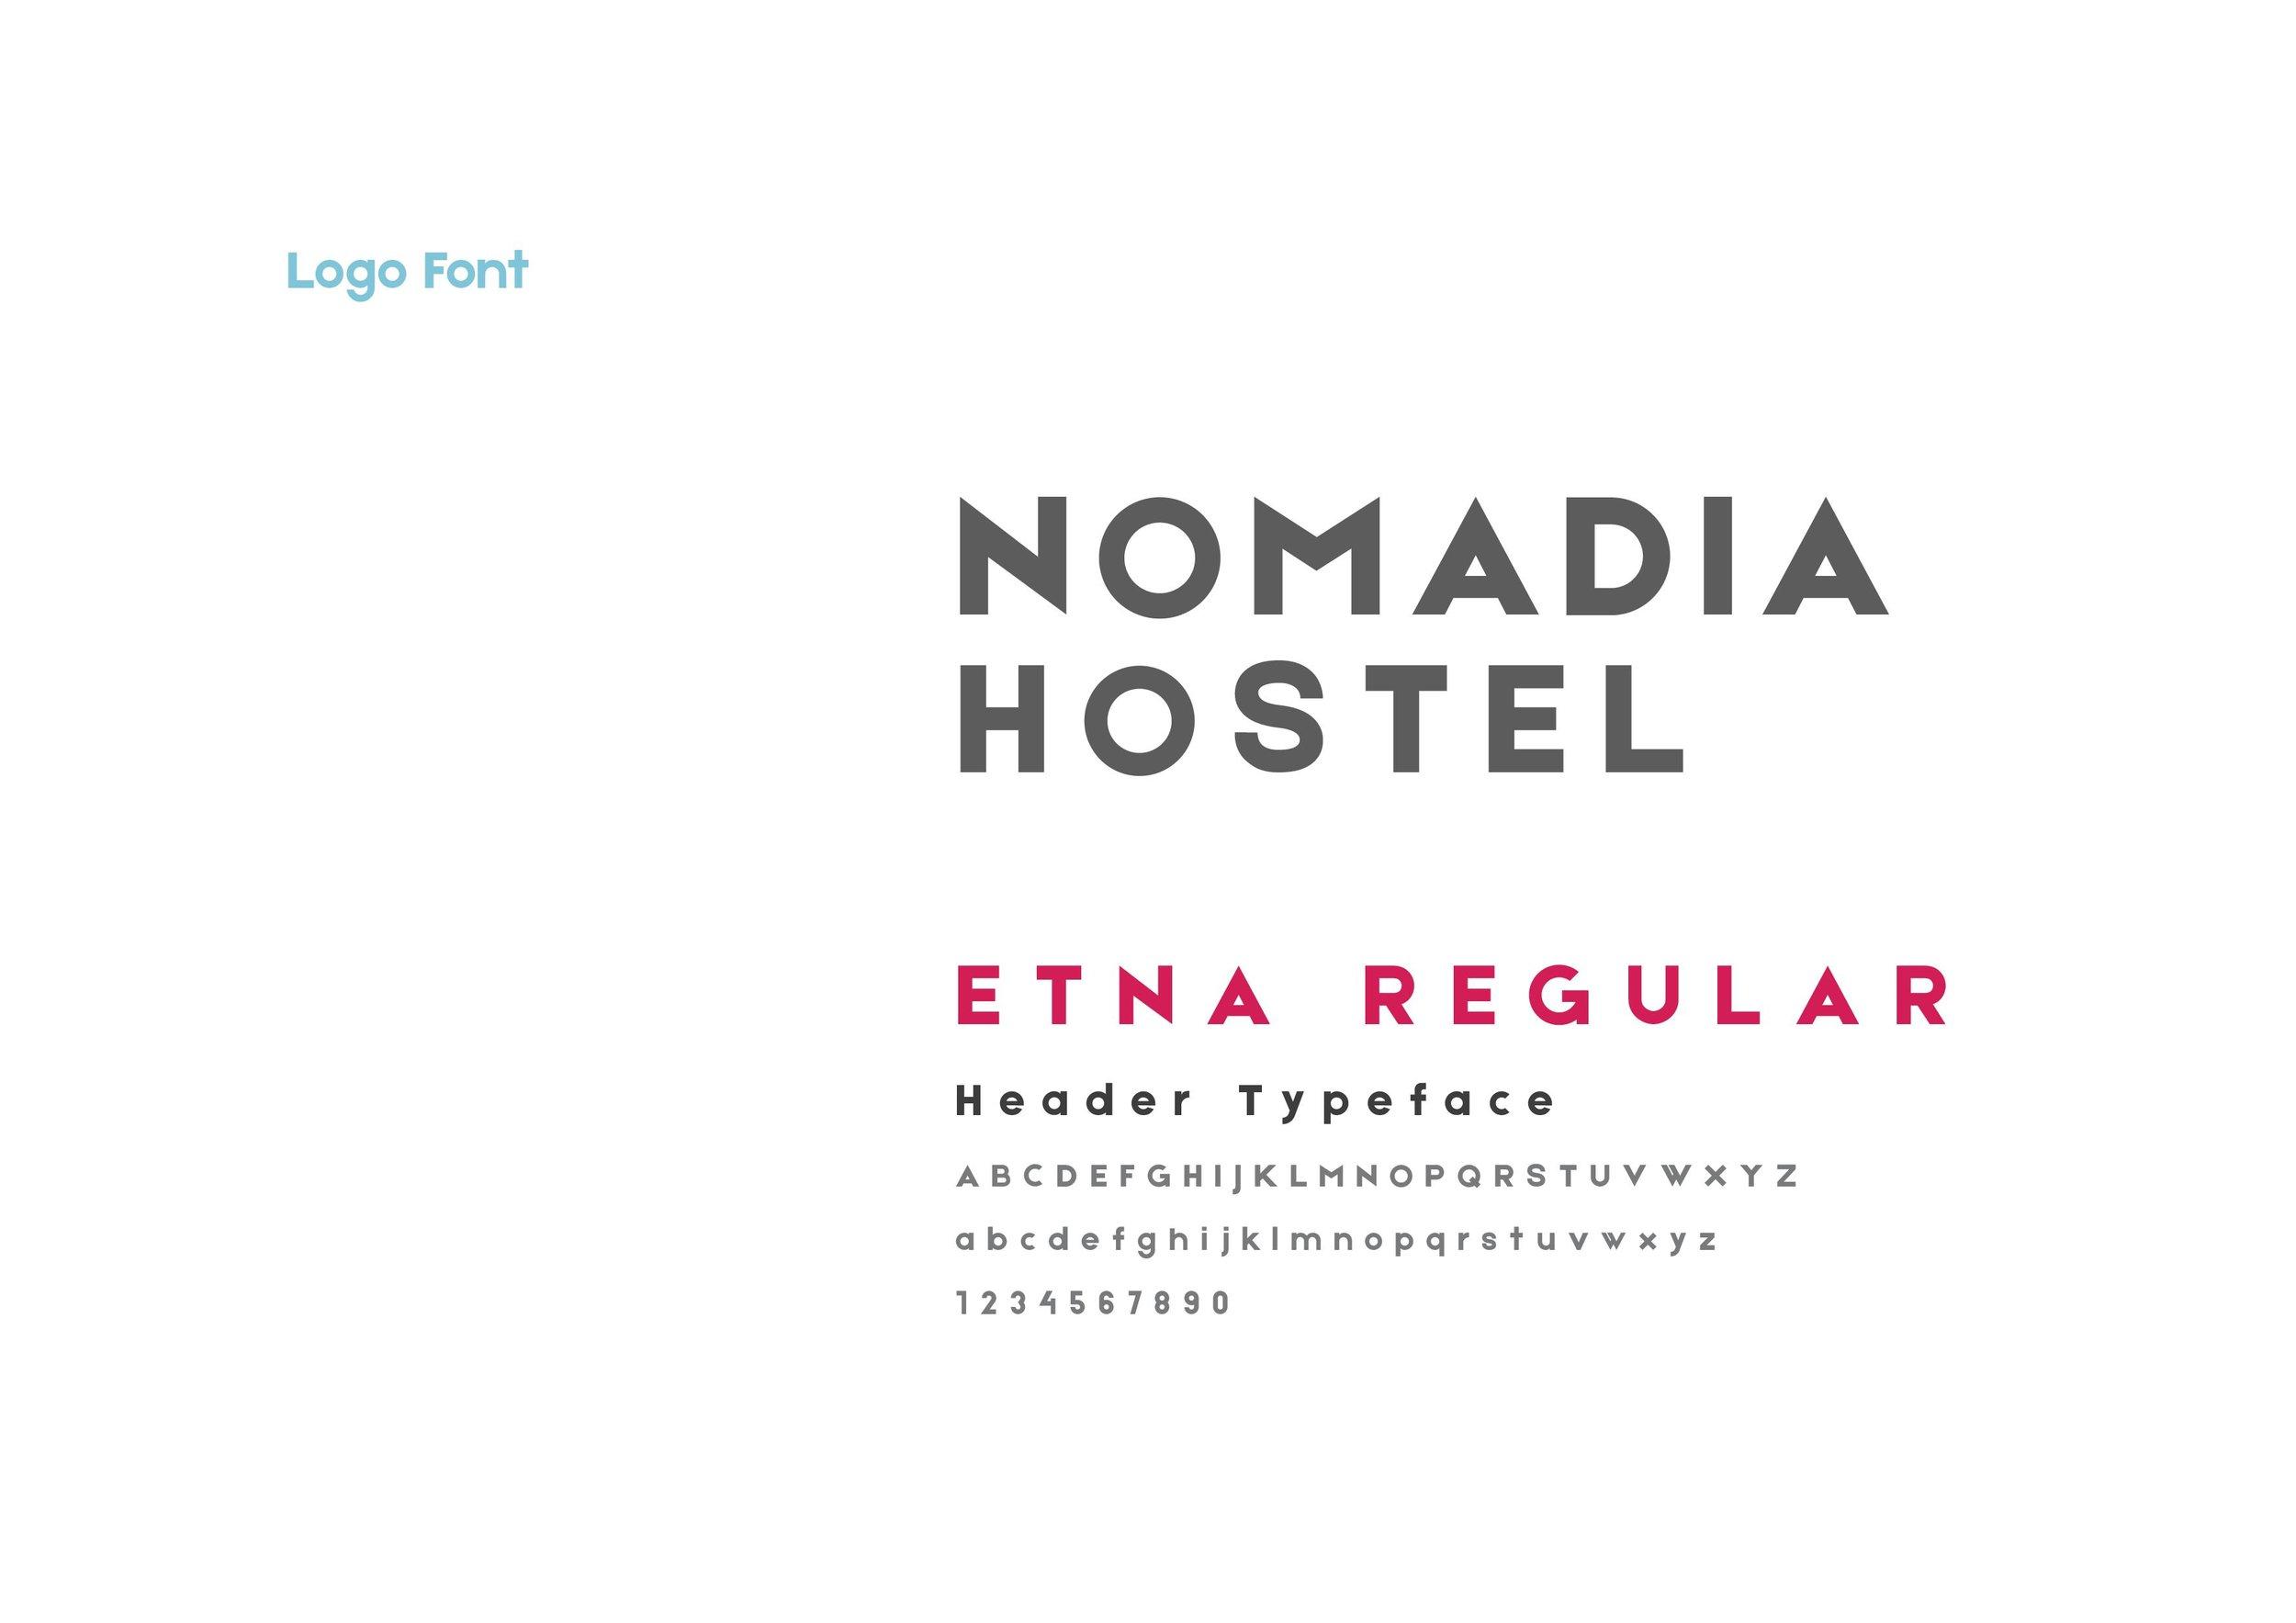 Brand Guideline_NomadiaHostel-page-012.jpg